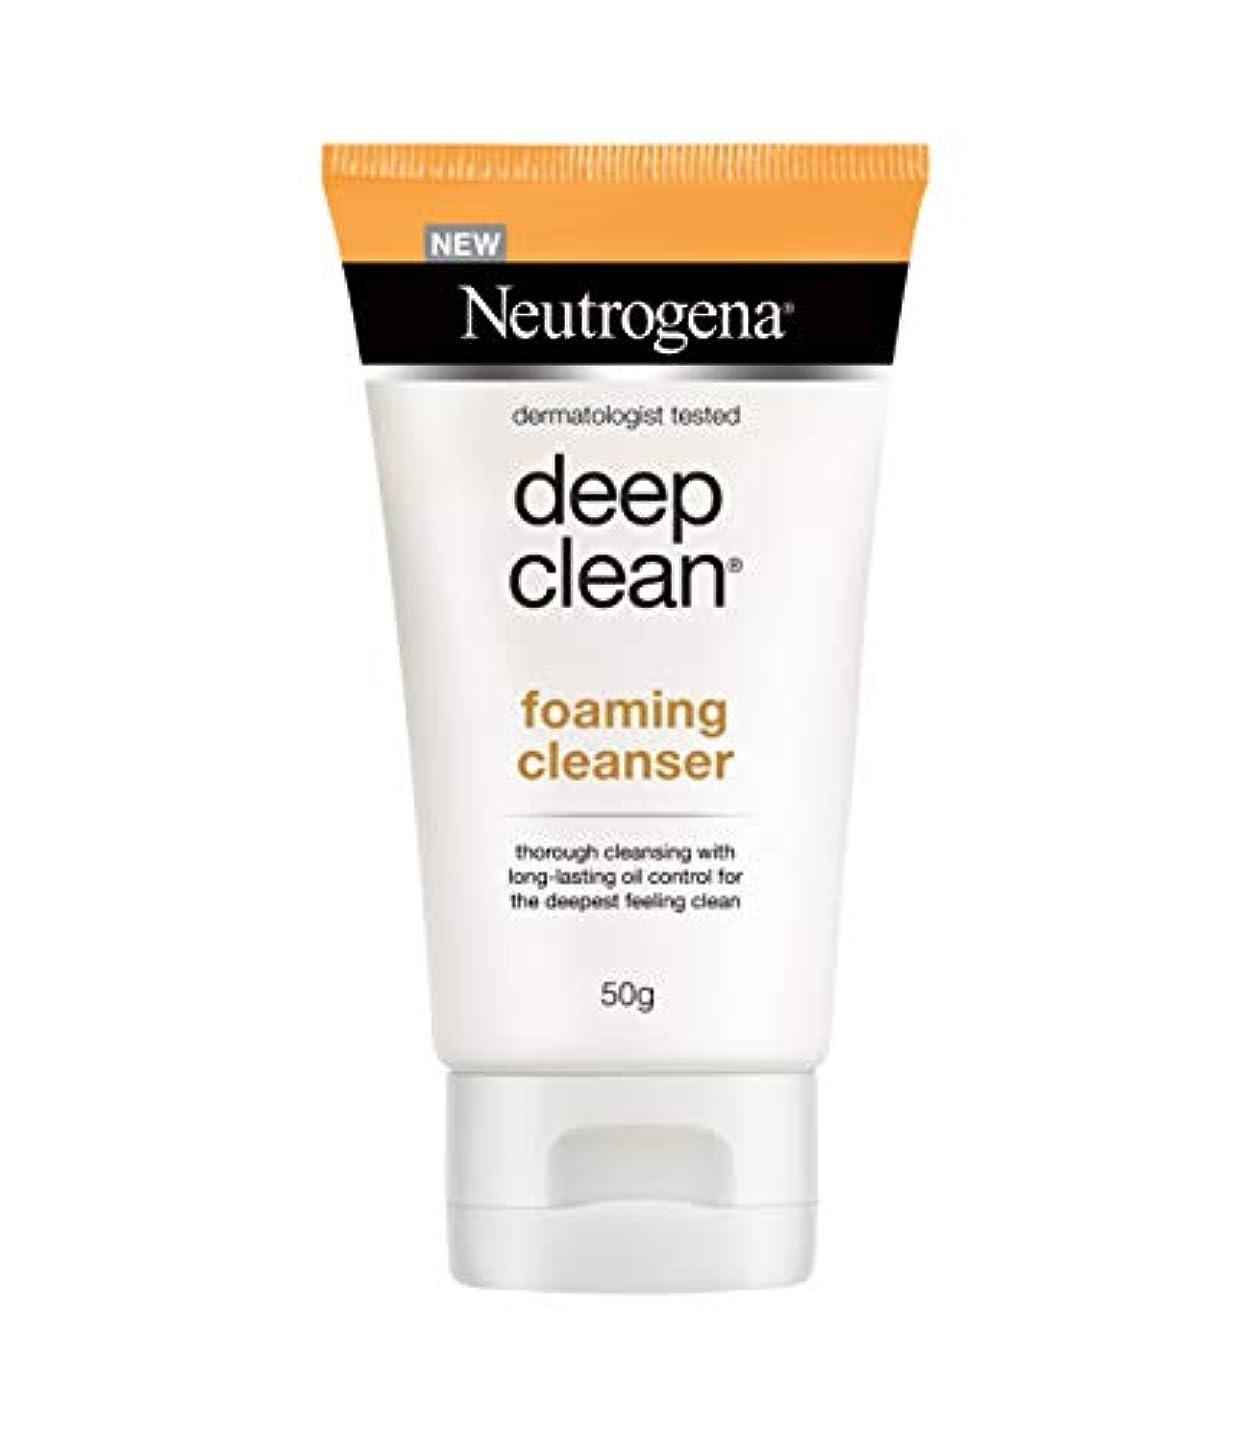 Neutrogena Deep Clean Foaming Cleanser, 50g